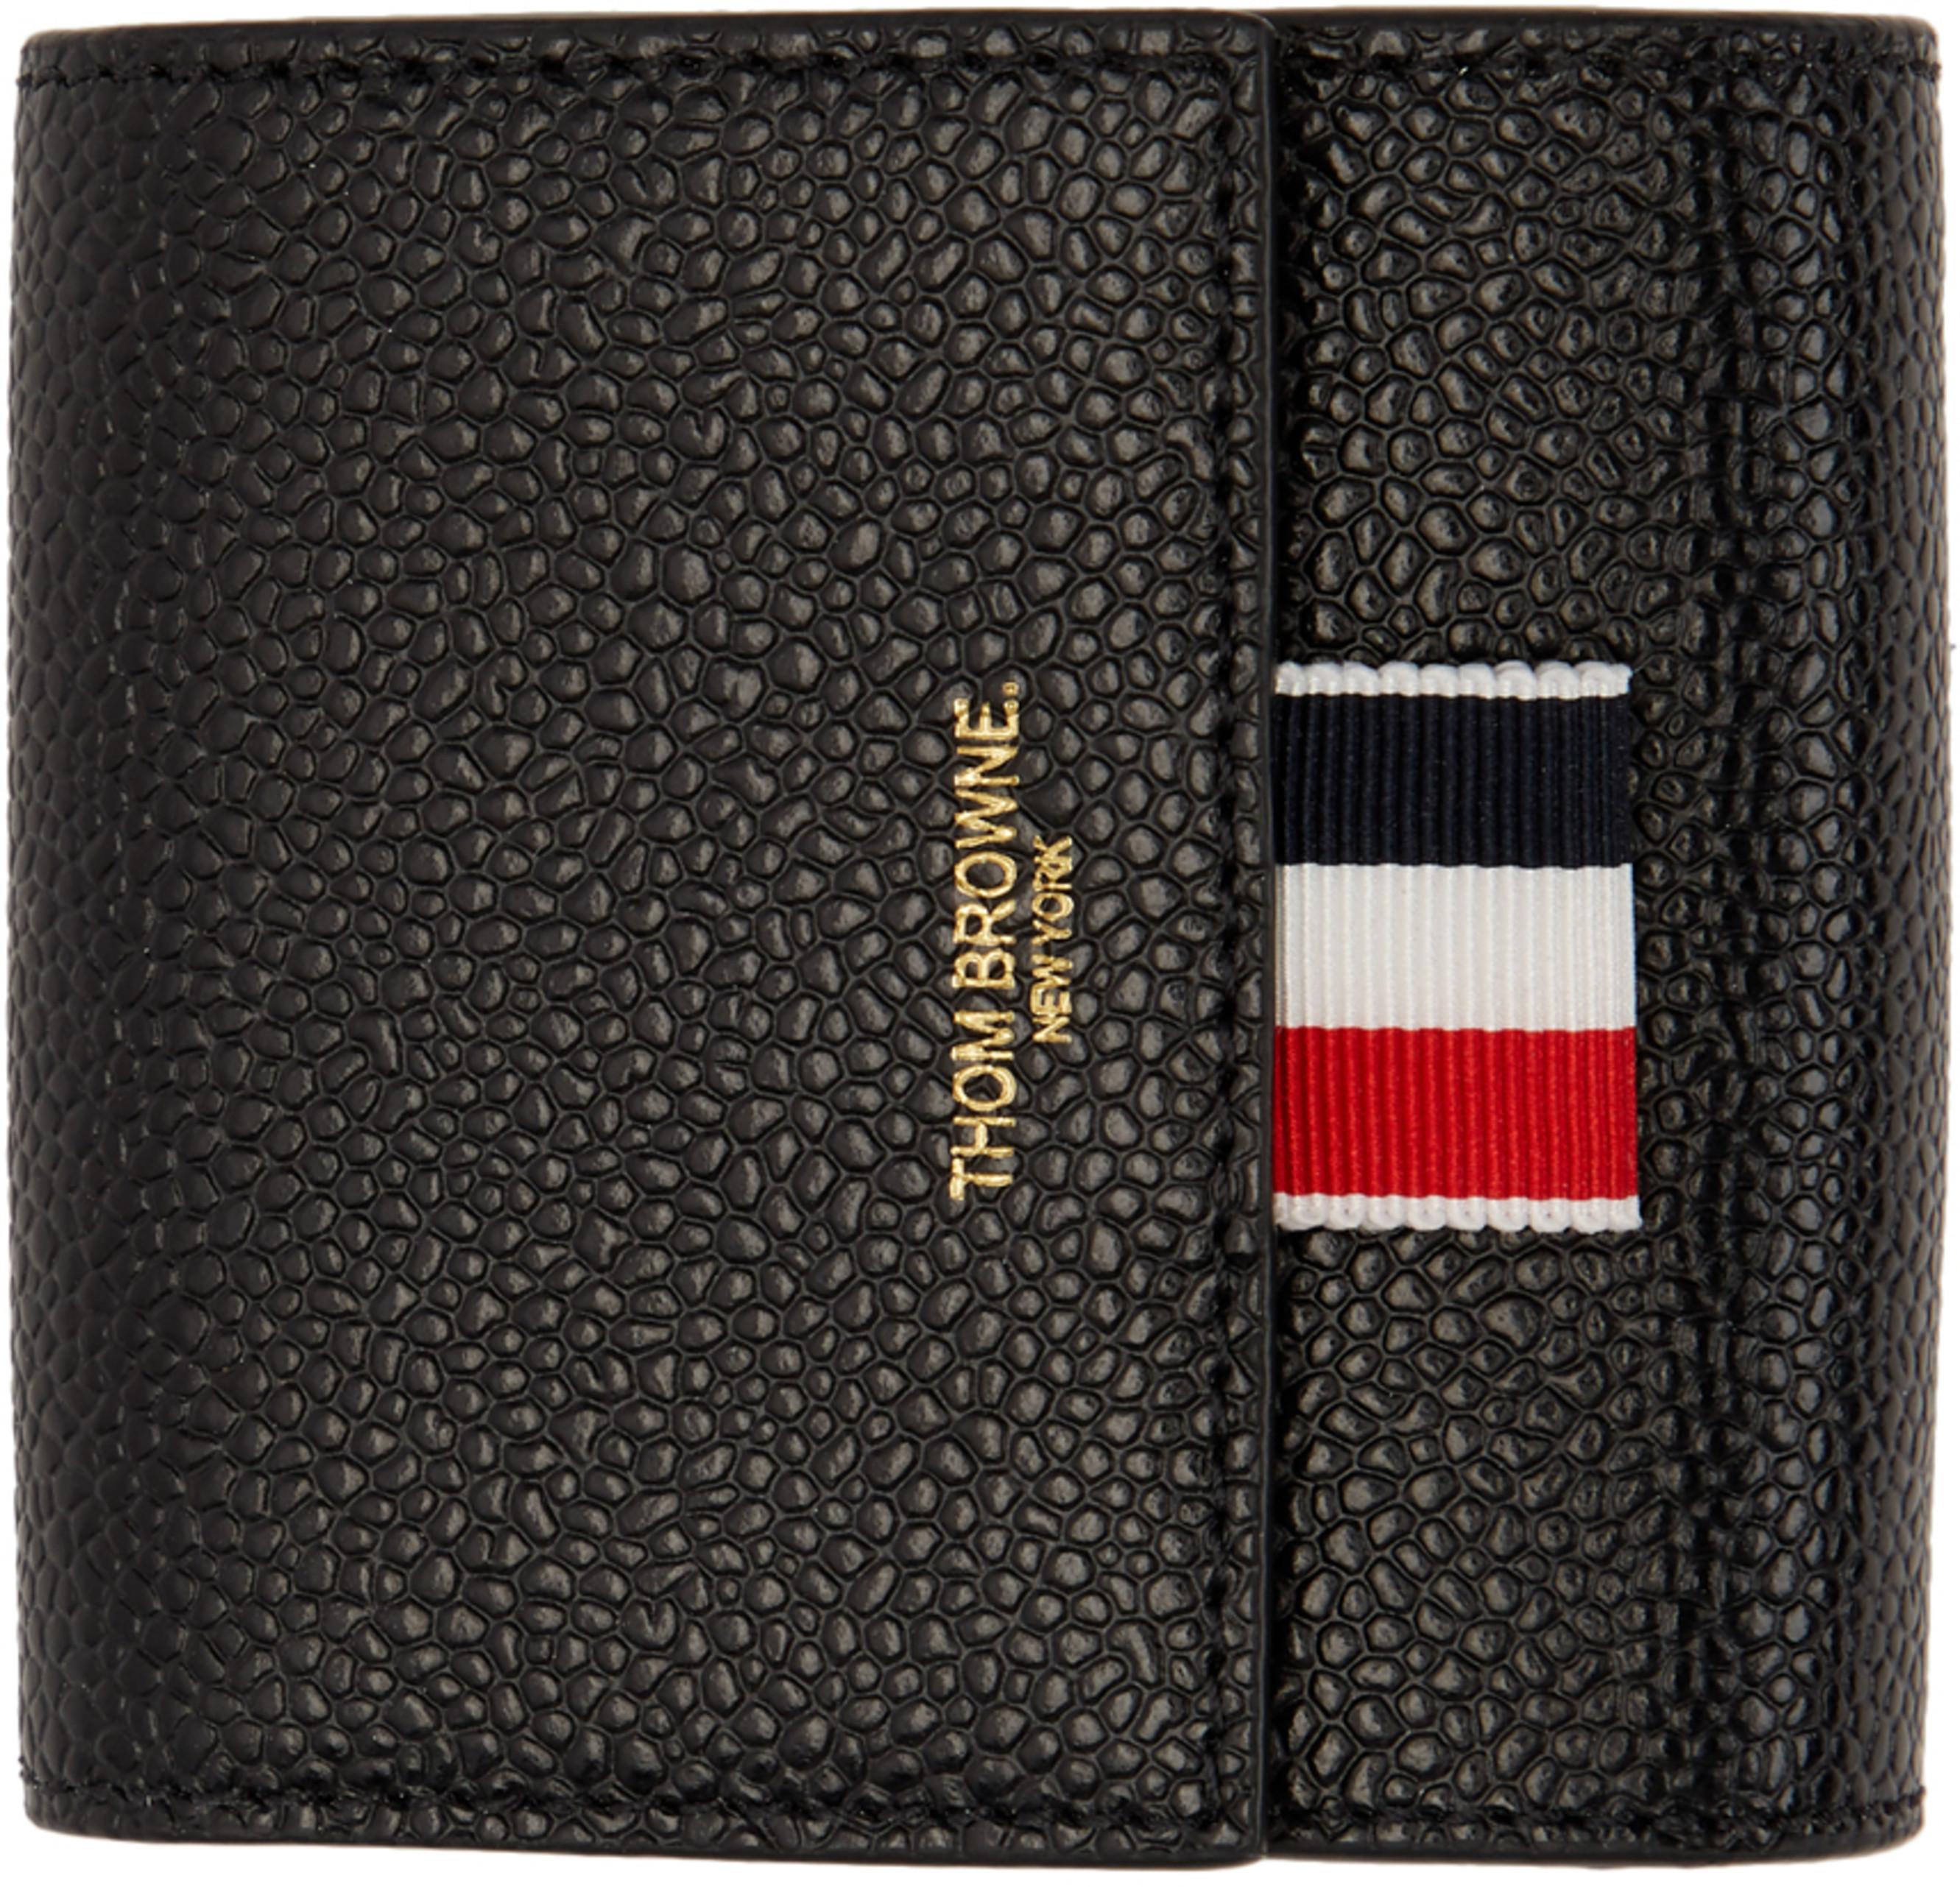 eb2e0da9087 Thom Browne pouches & document holders for Men | SSENSE